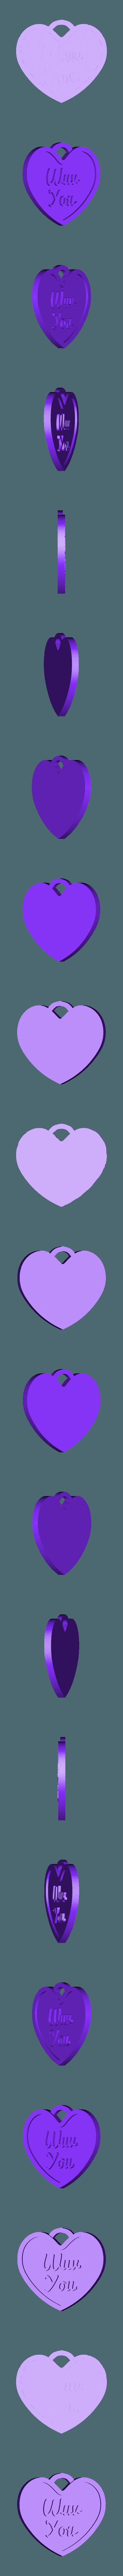 CUSTOM heart.stl Download STL file Jewelry Pack - Bracelet Wristband Pendant Military Dog Tag Heart • 3D printer model, Custom3DPrinting